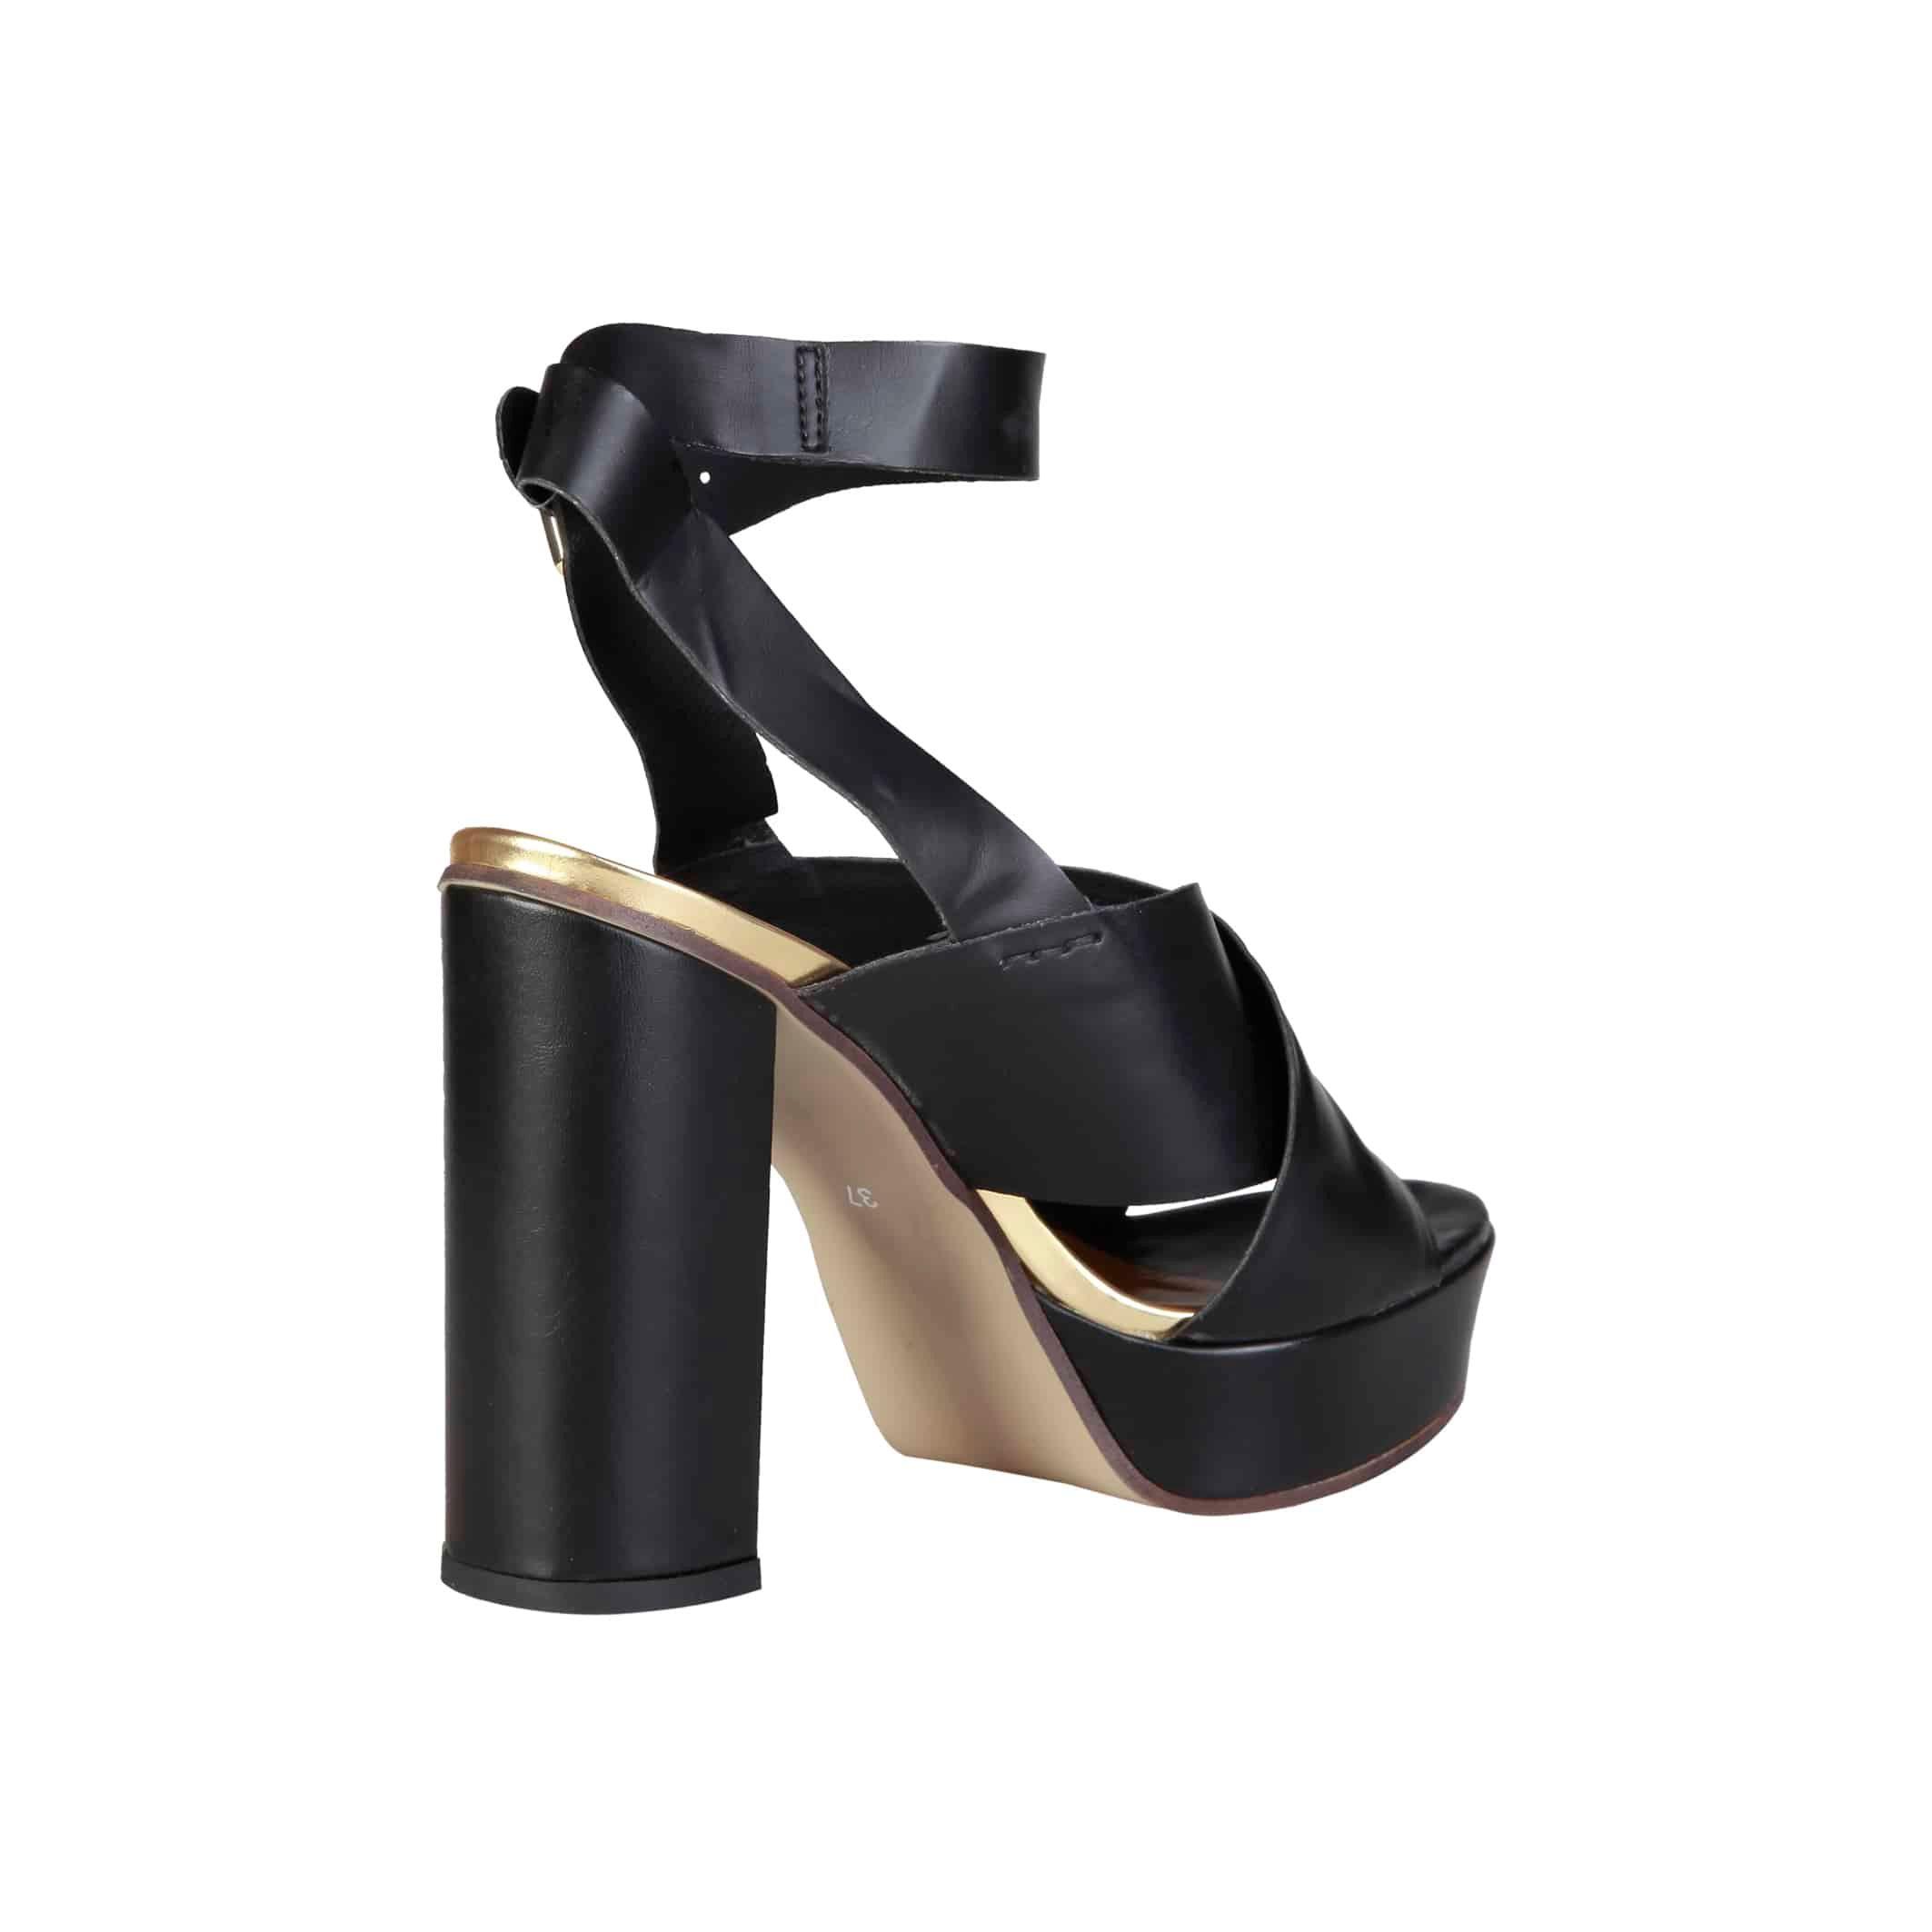 Sandals Pierre Cardin – CELIE